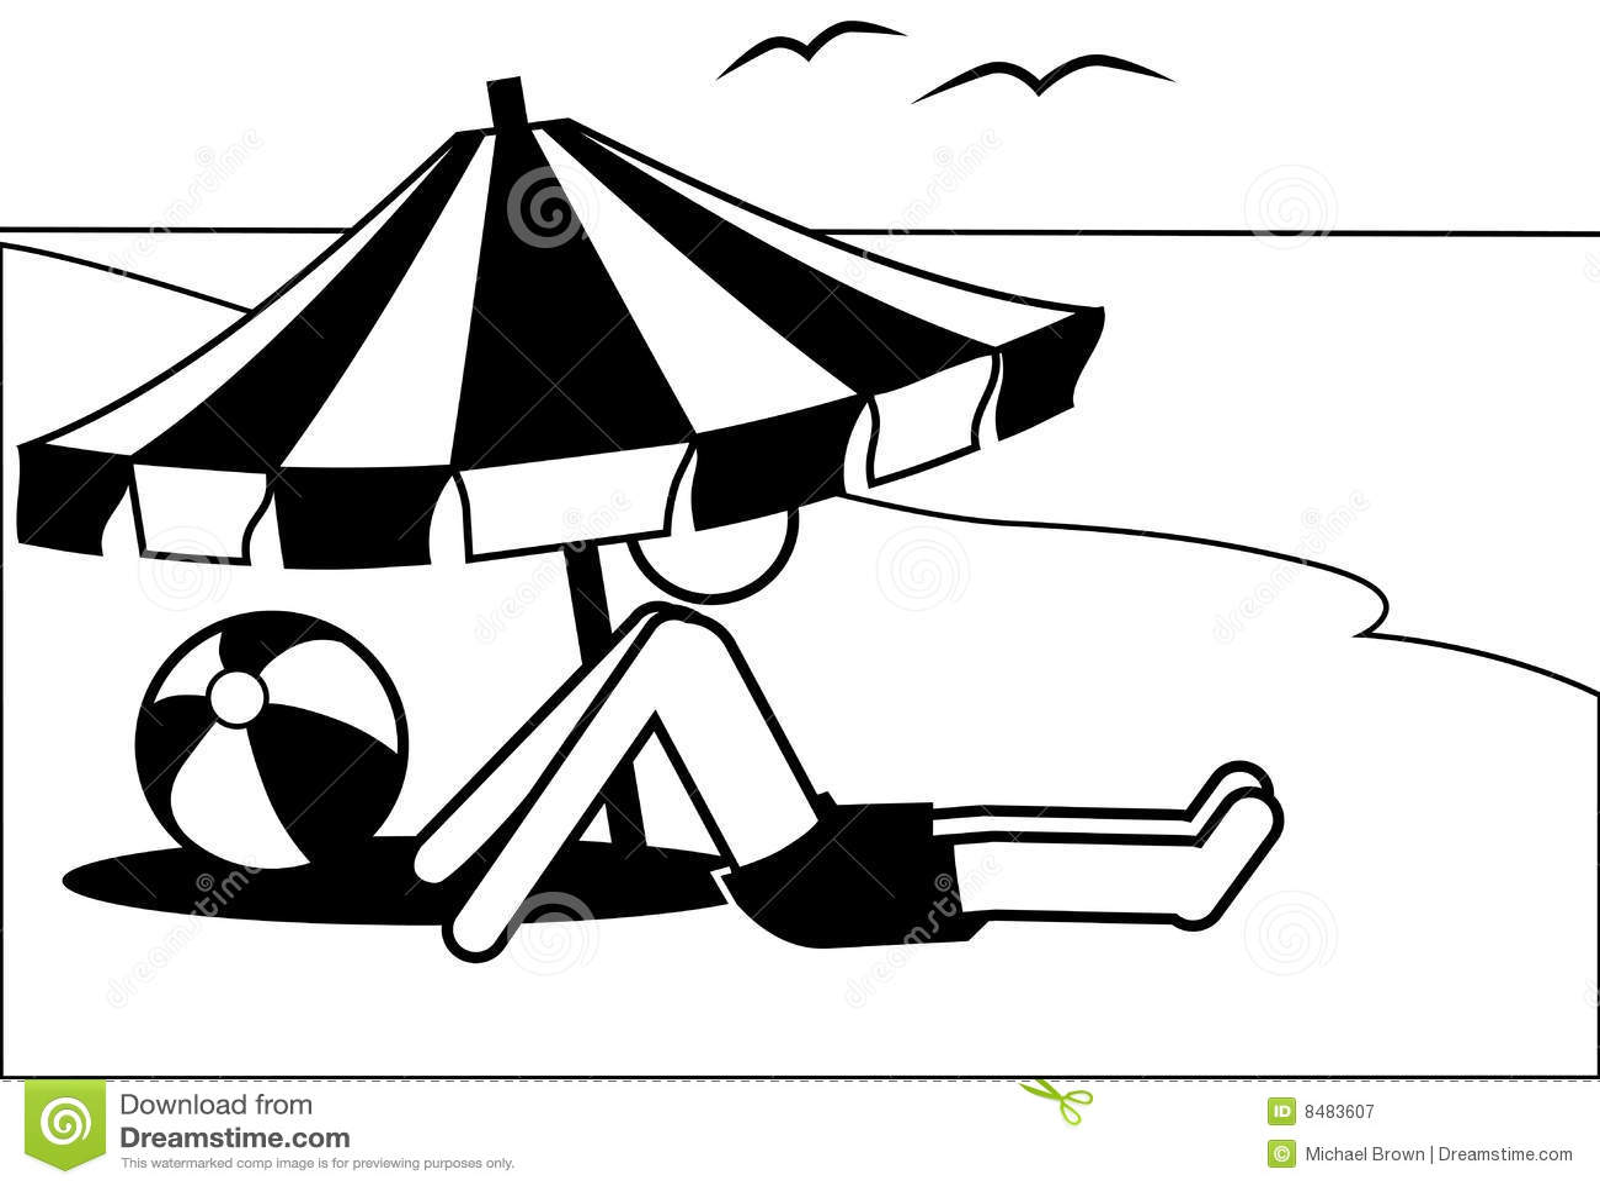 Symbol Man Vacations Under Beach Umbrella By Sea Royalty Free Stock Photography